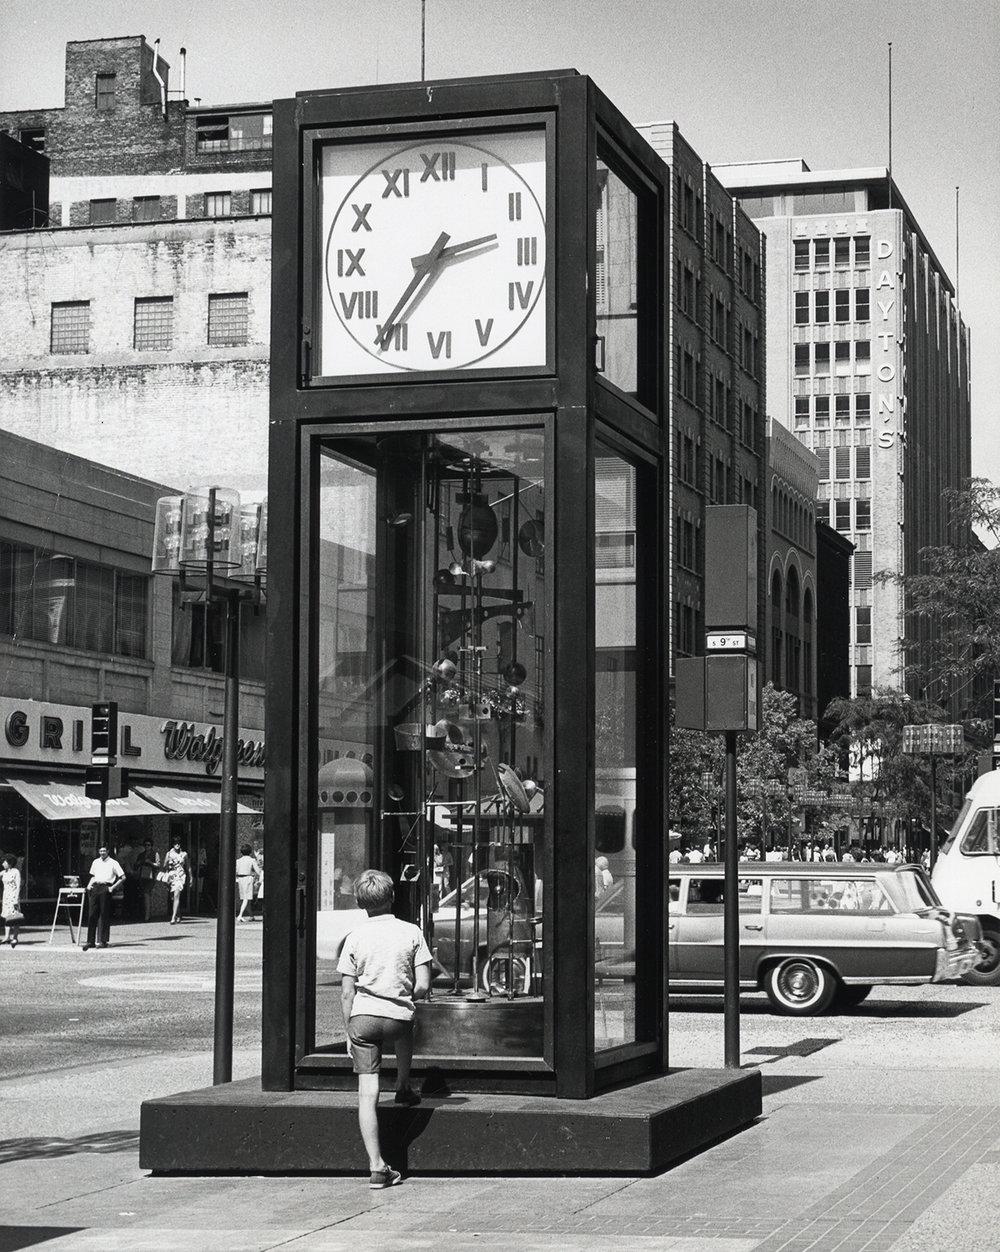 Sculpture Clock installed, 1968